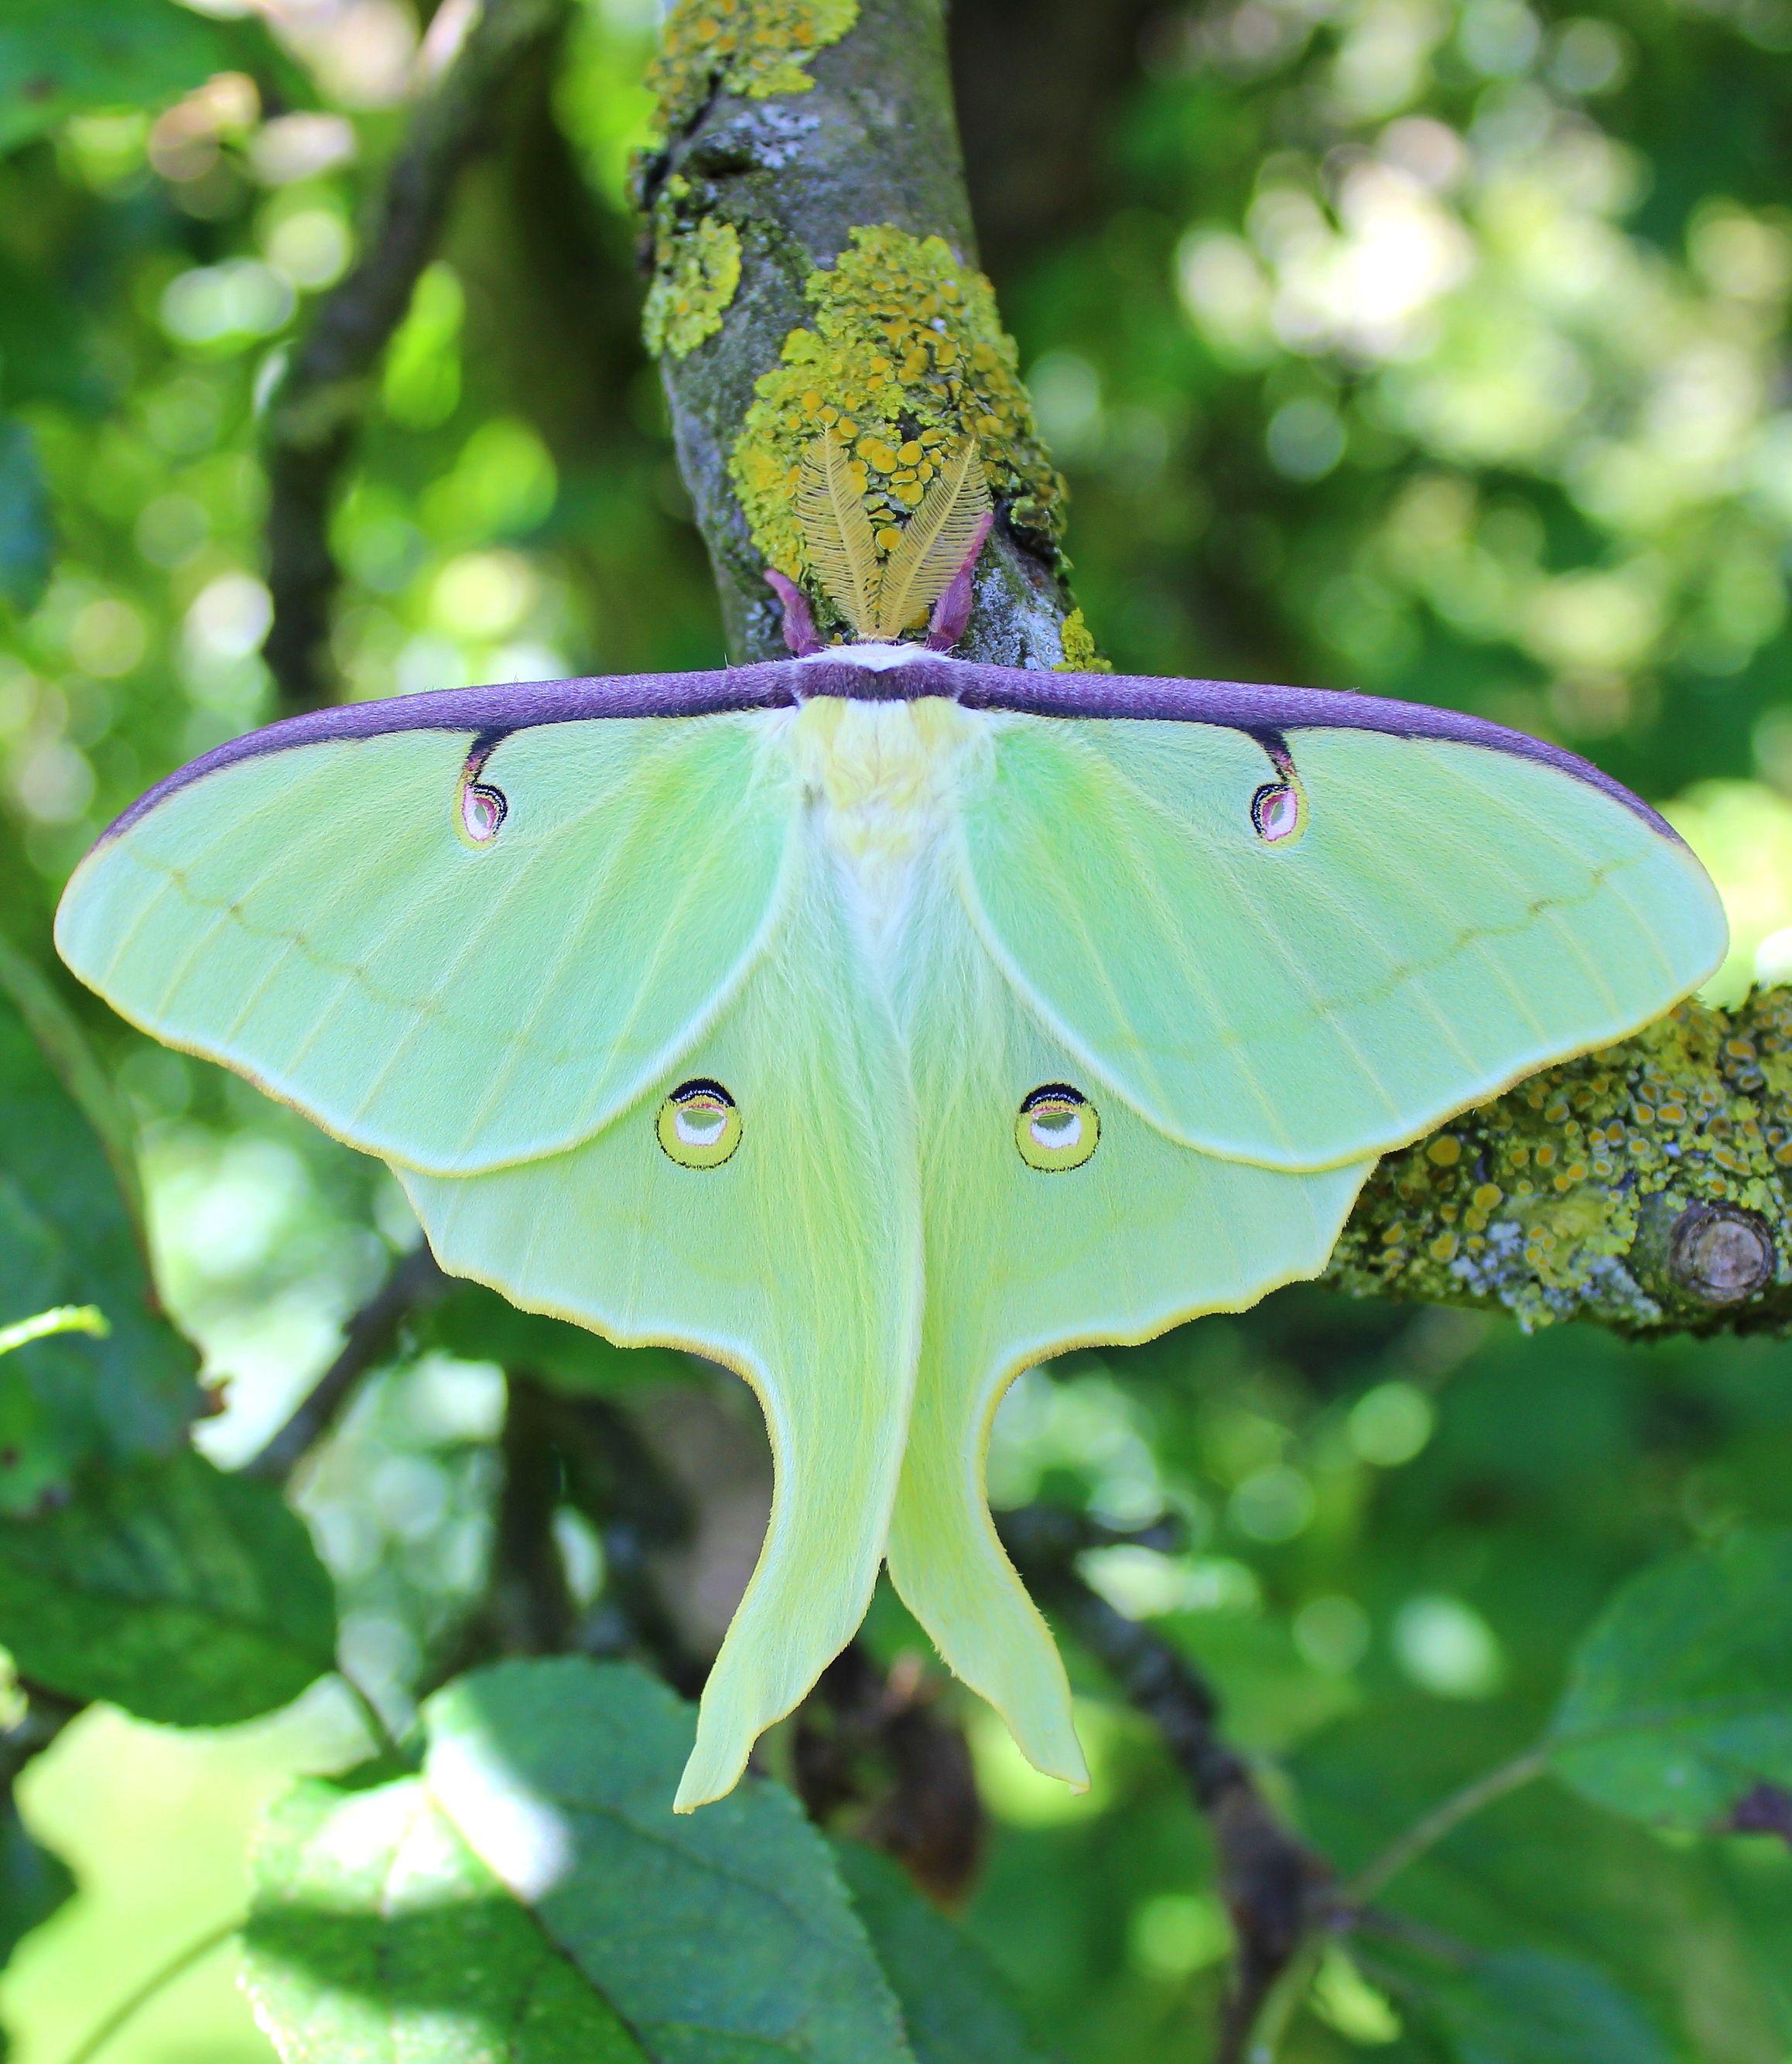 Actias Luna Luna Moth Saturniidae Lepidoptera Schone Schmetterlinge Schmetterling Insekten